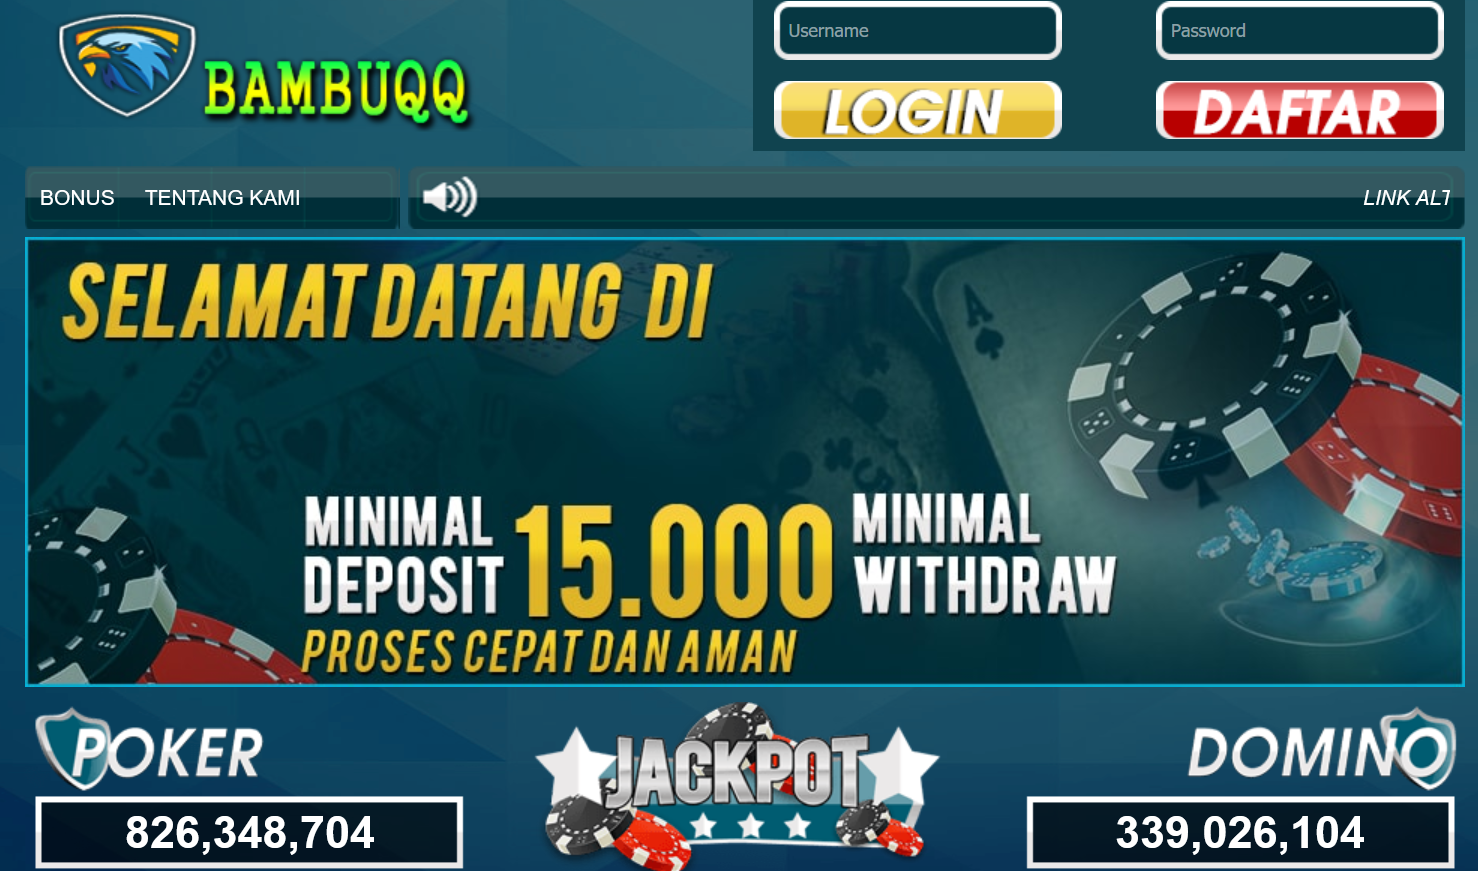 domino99 online bambuqq